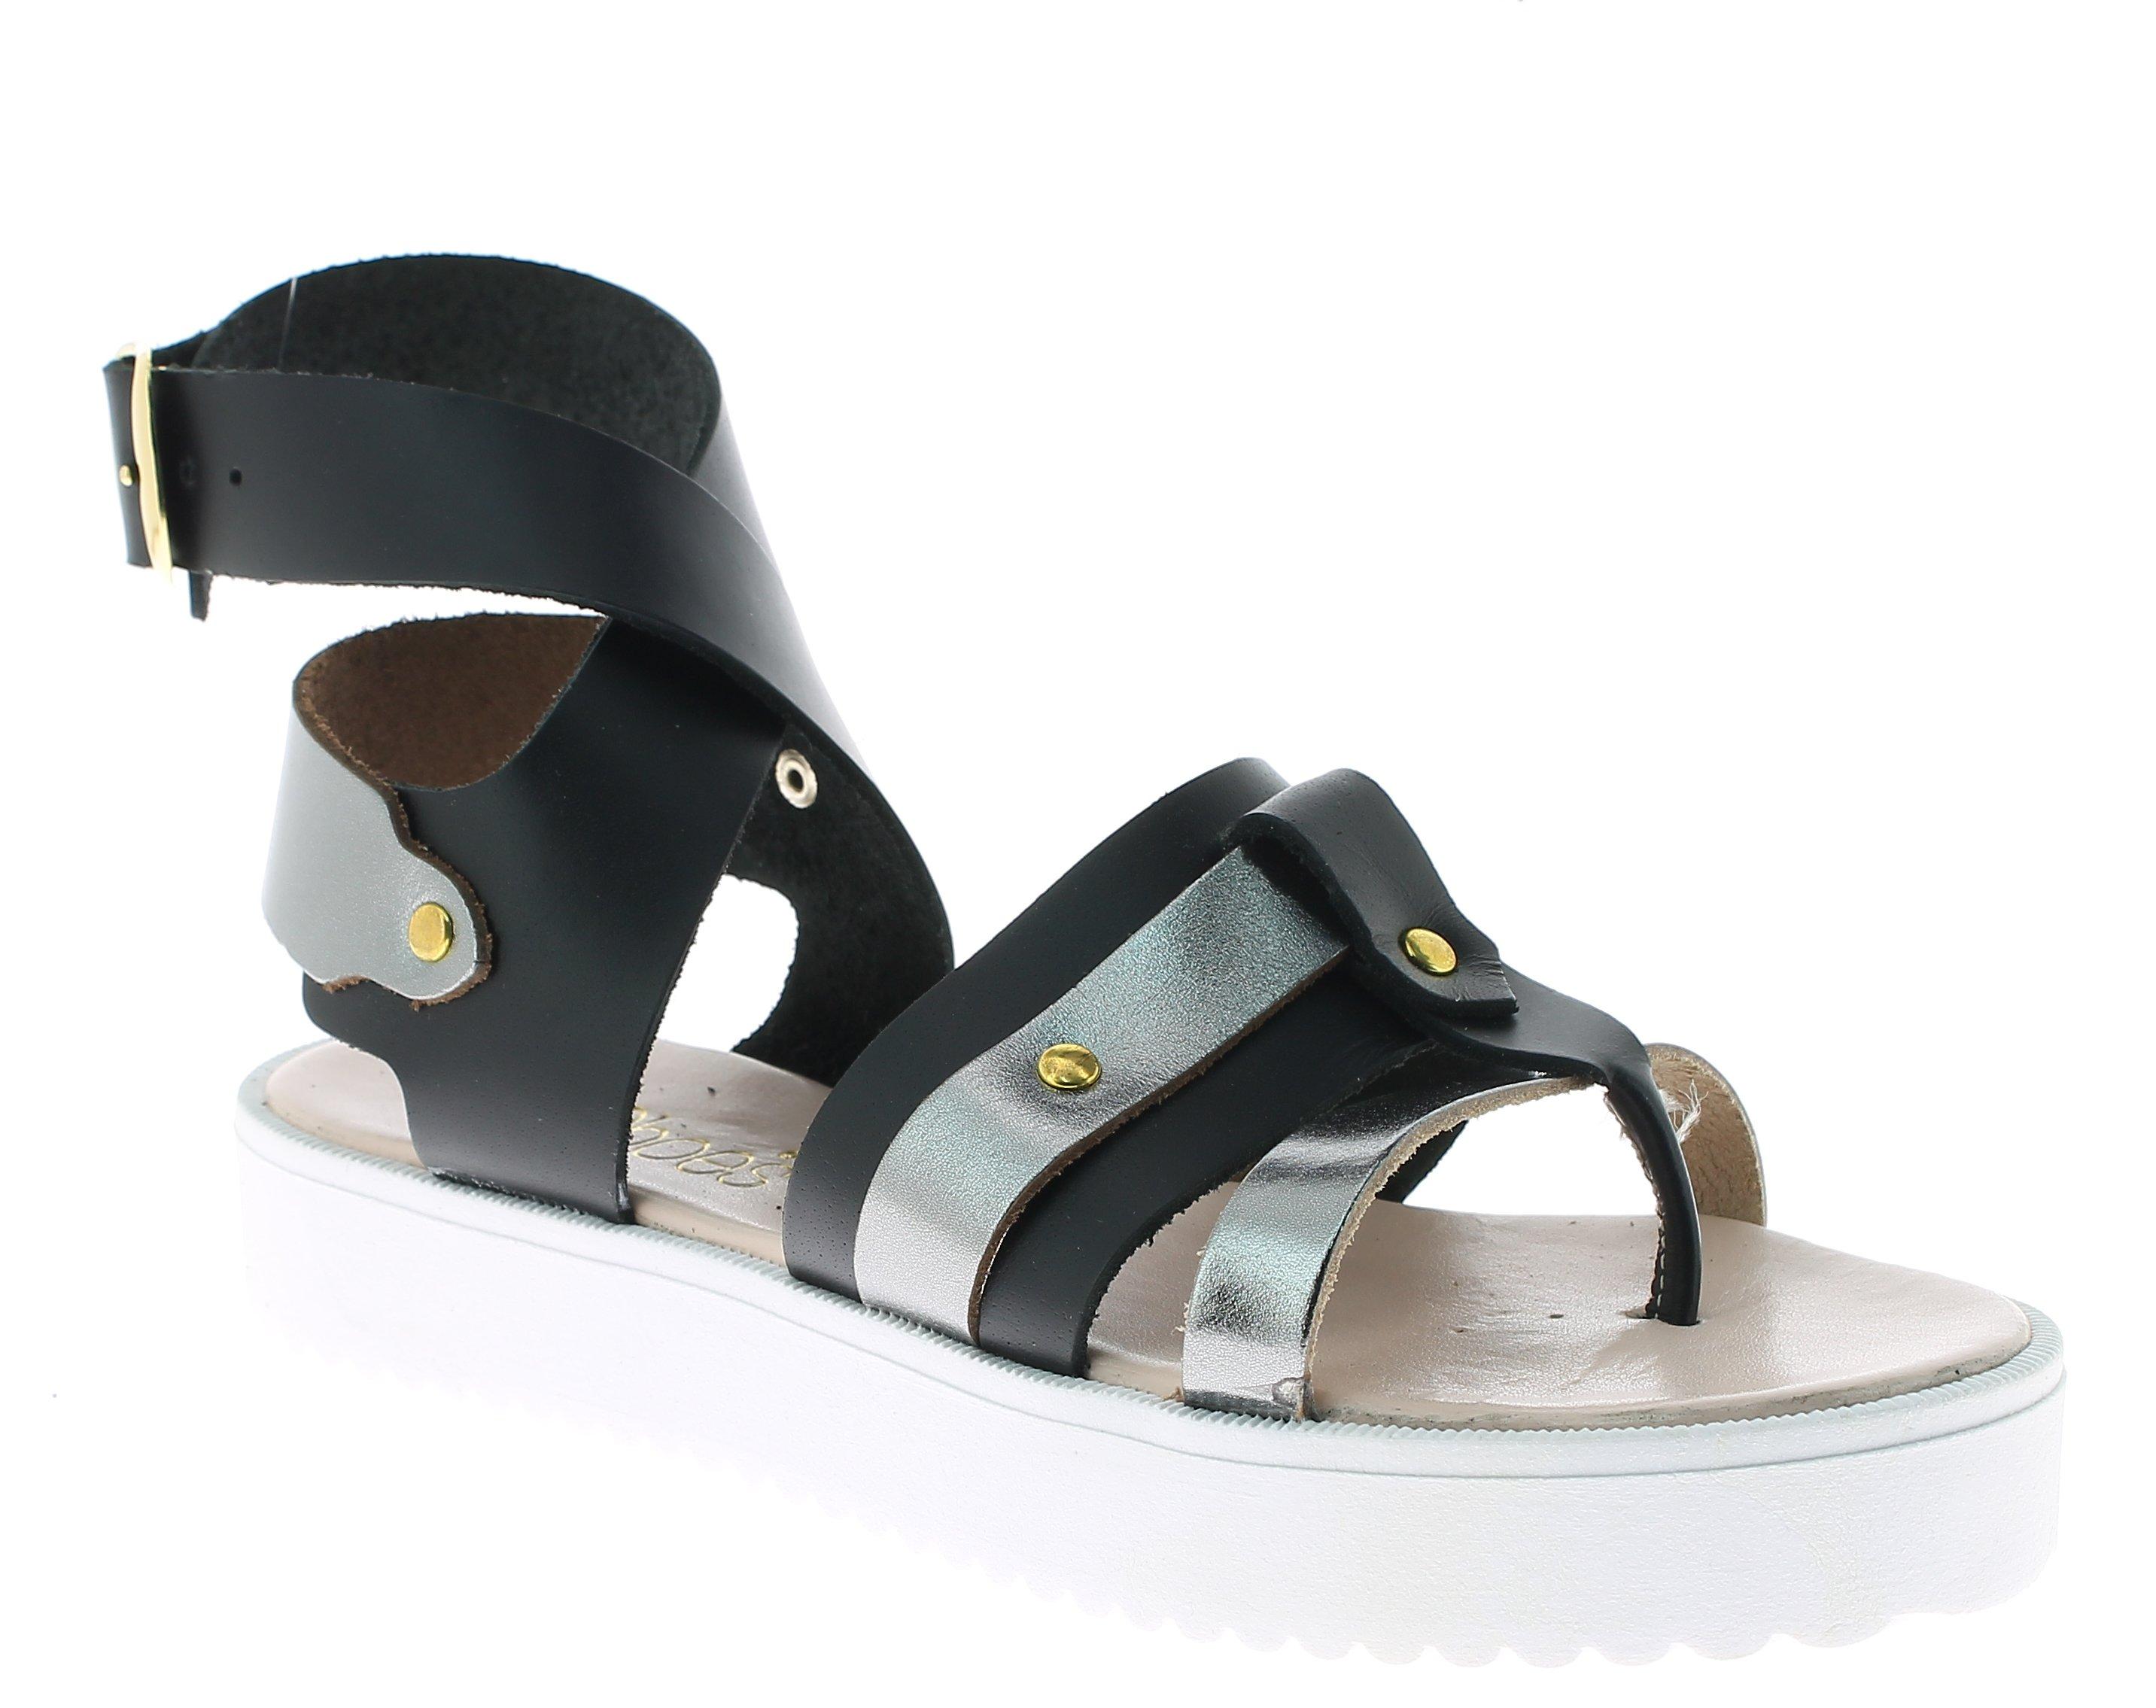 IQSHOES Γυναικείο Πέδιλο B45 Μαύρο - IqShoes - 50.B45T BLACK -IQSHOES-black-40/1 παπούτσια  προσφορεσ